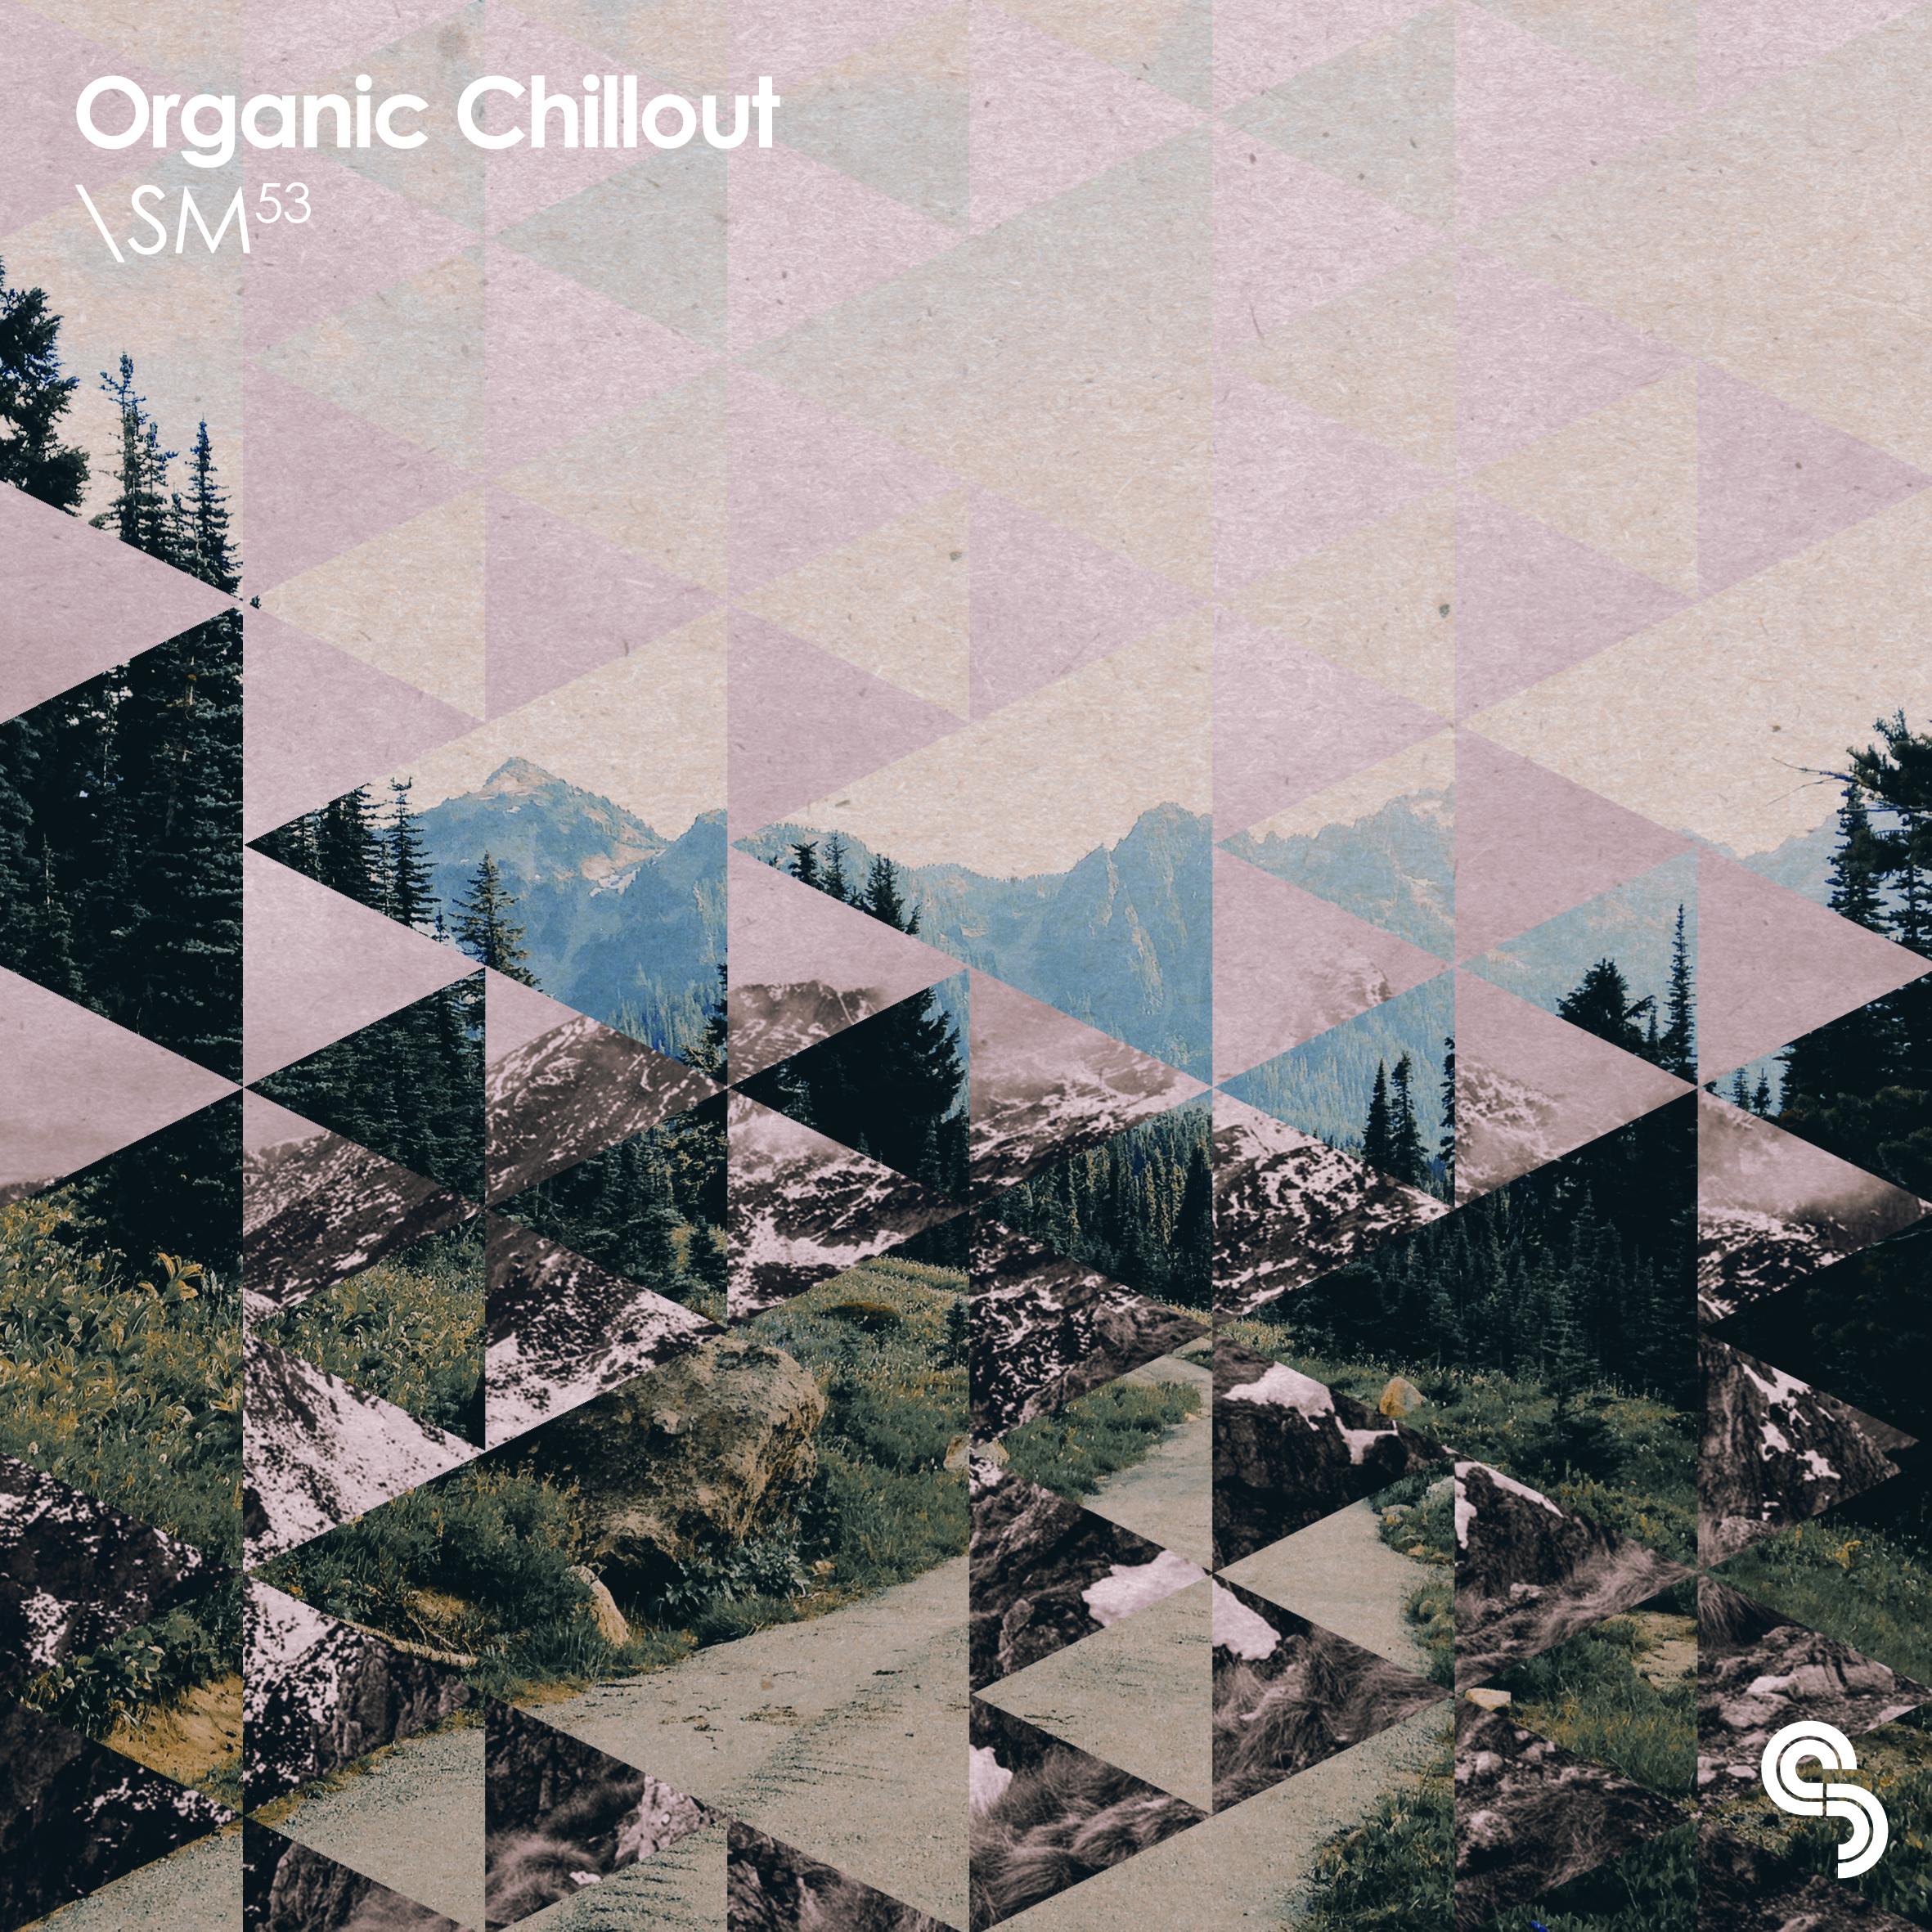 Sample Magic Organic Chillout